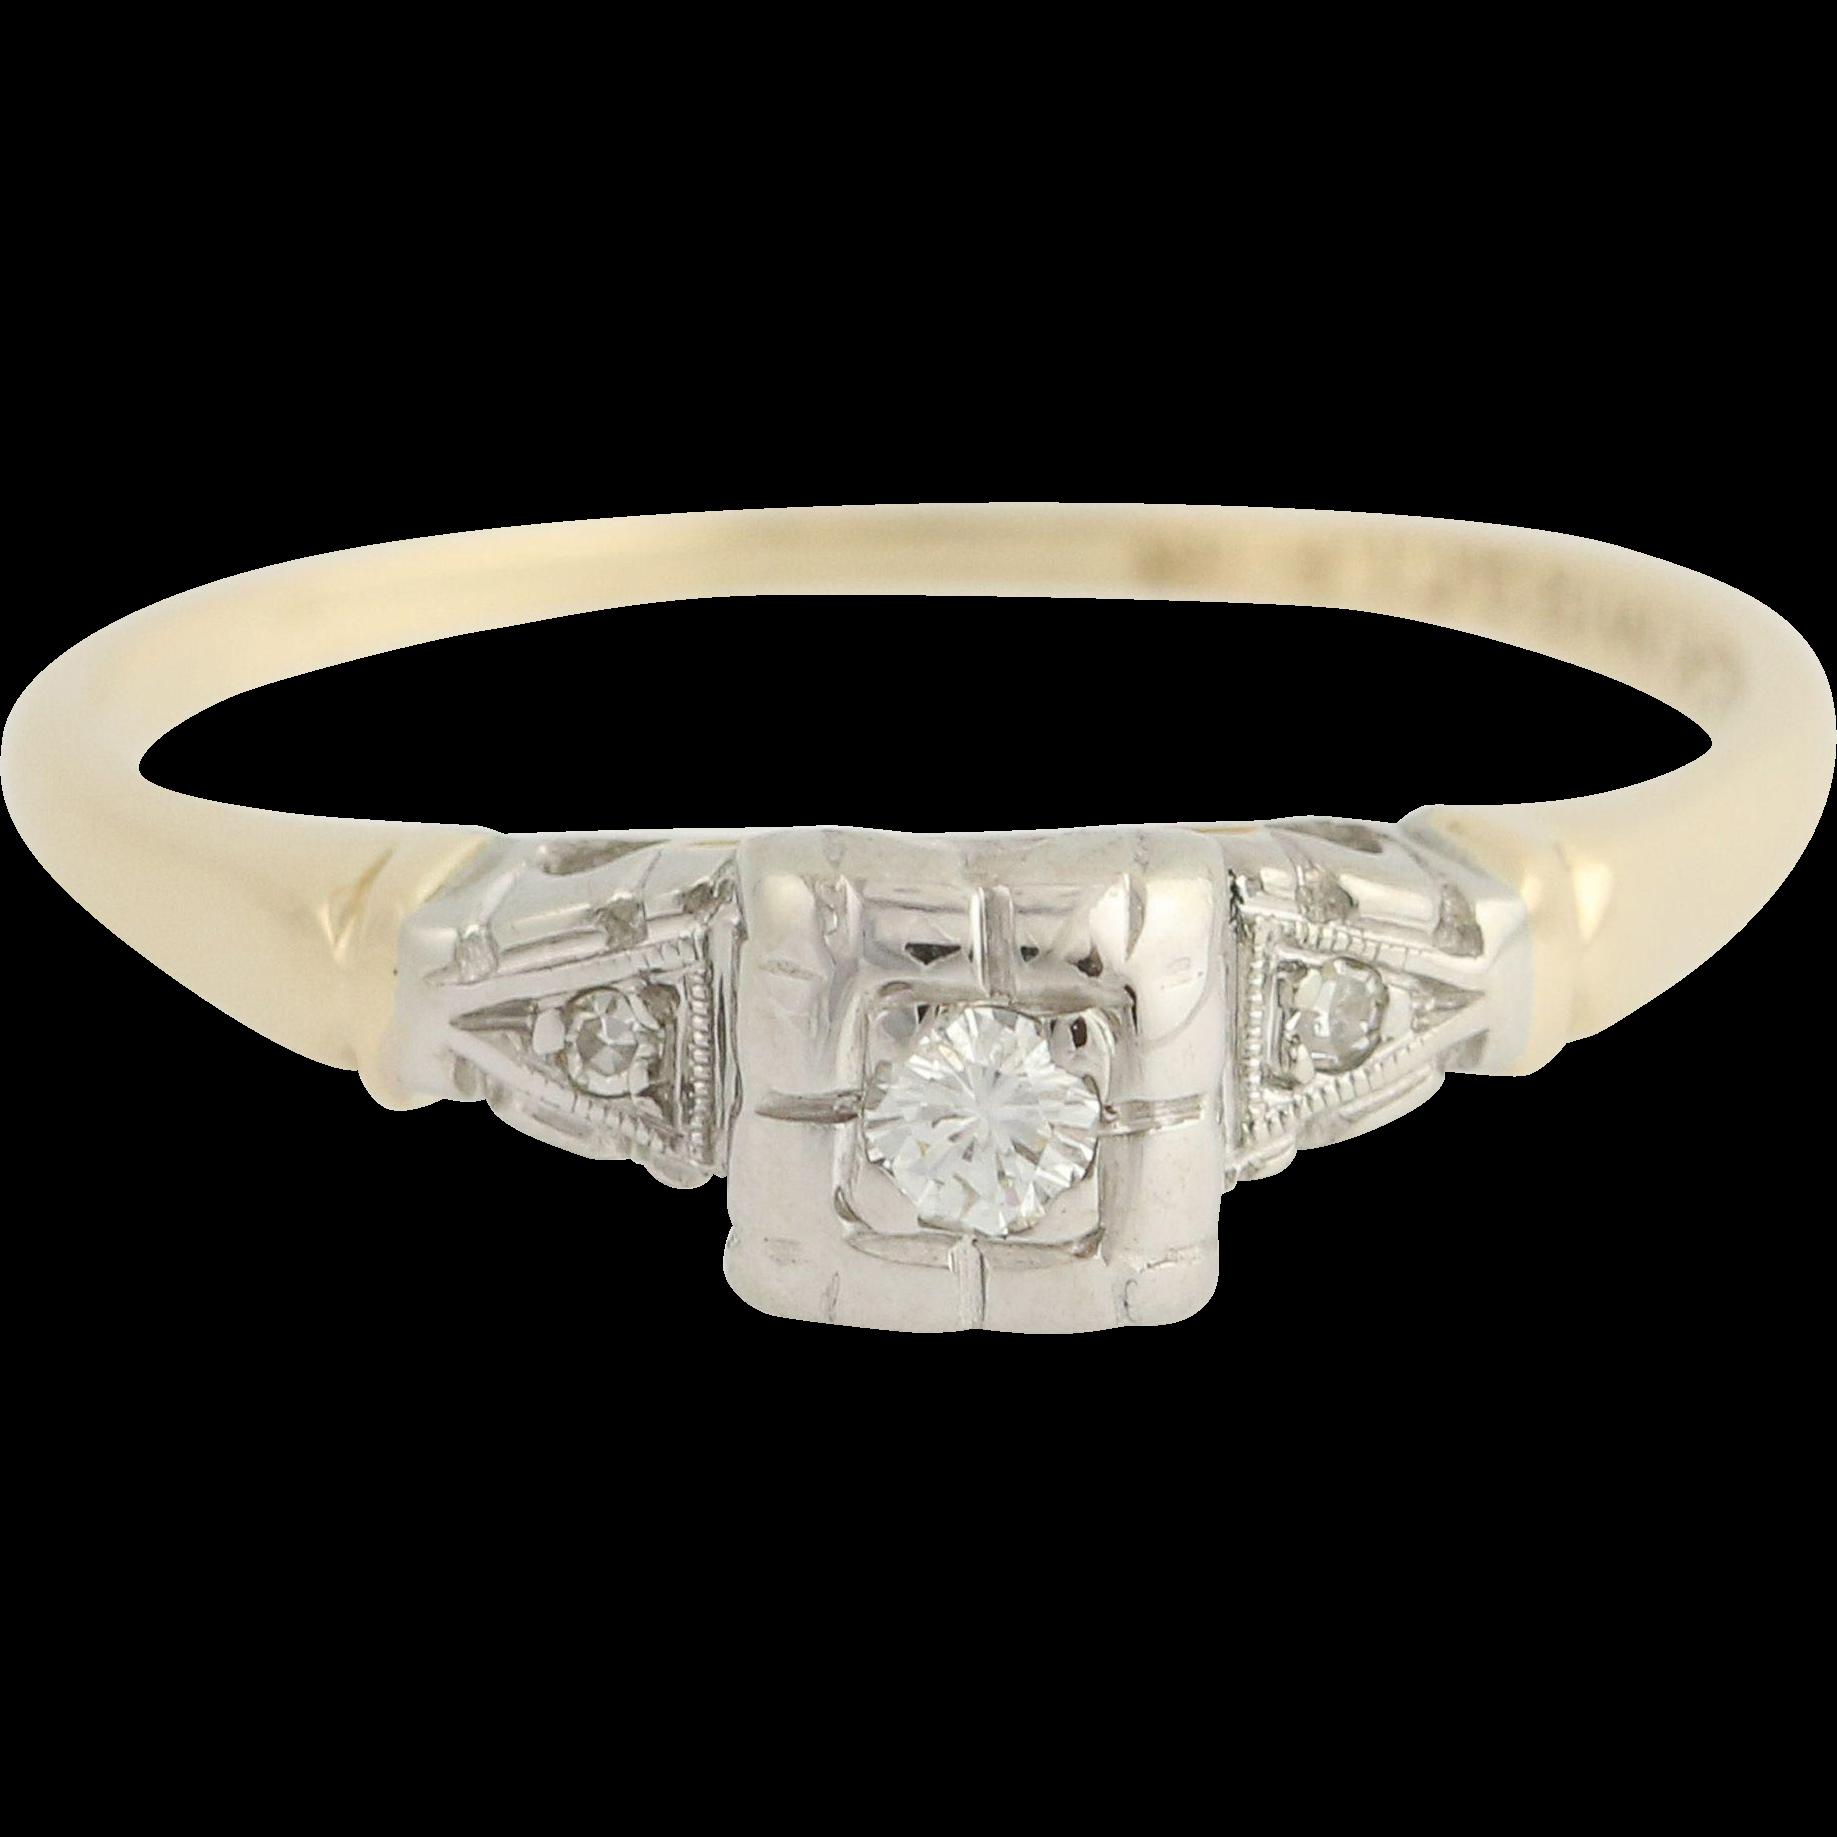 Vintage Diamond Engagement Ring - 14k Yellow & White Gold 6 1/2 Genuine .07ctw Unique Engagement Ring